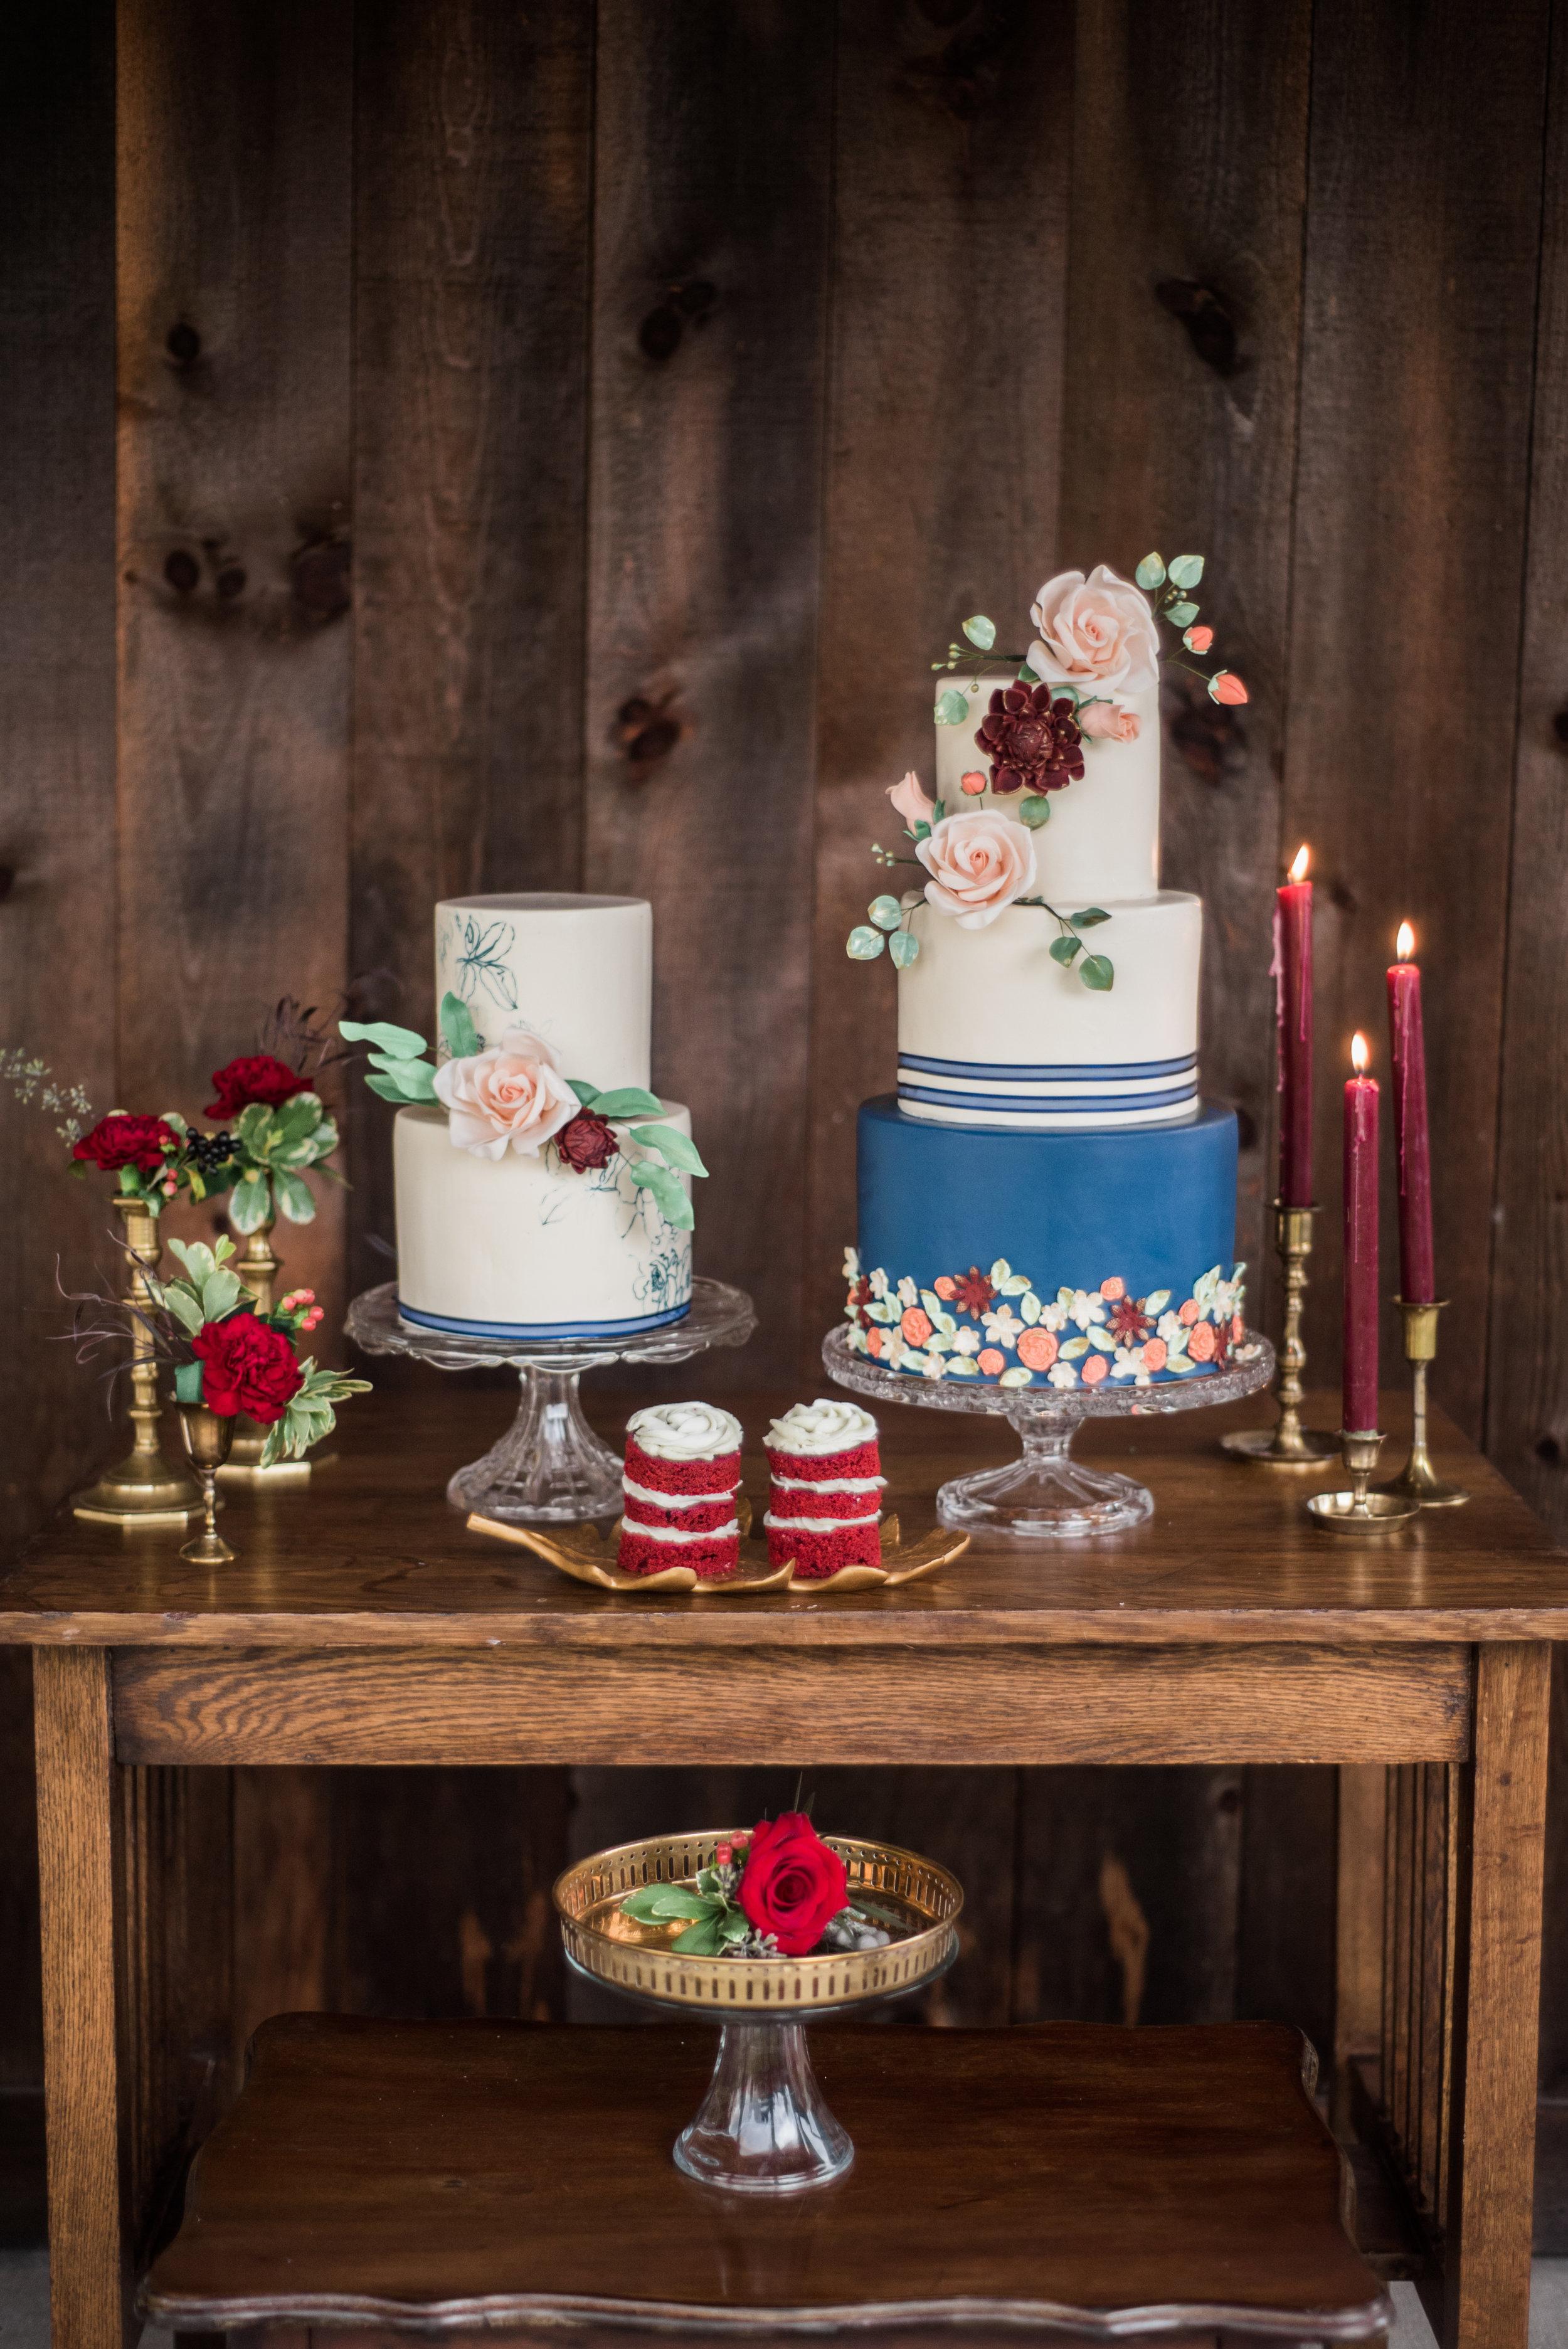 Cakes by Nicole of  Cakeity Cakes